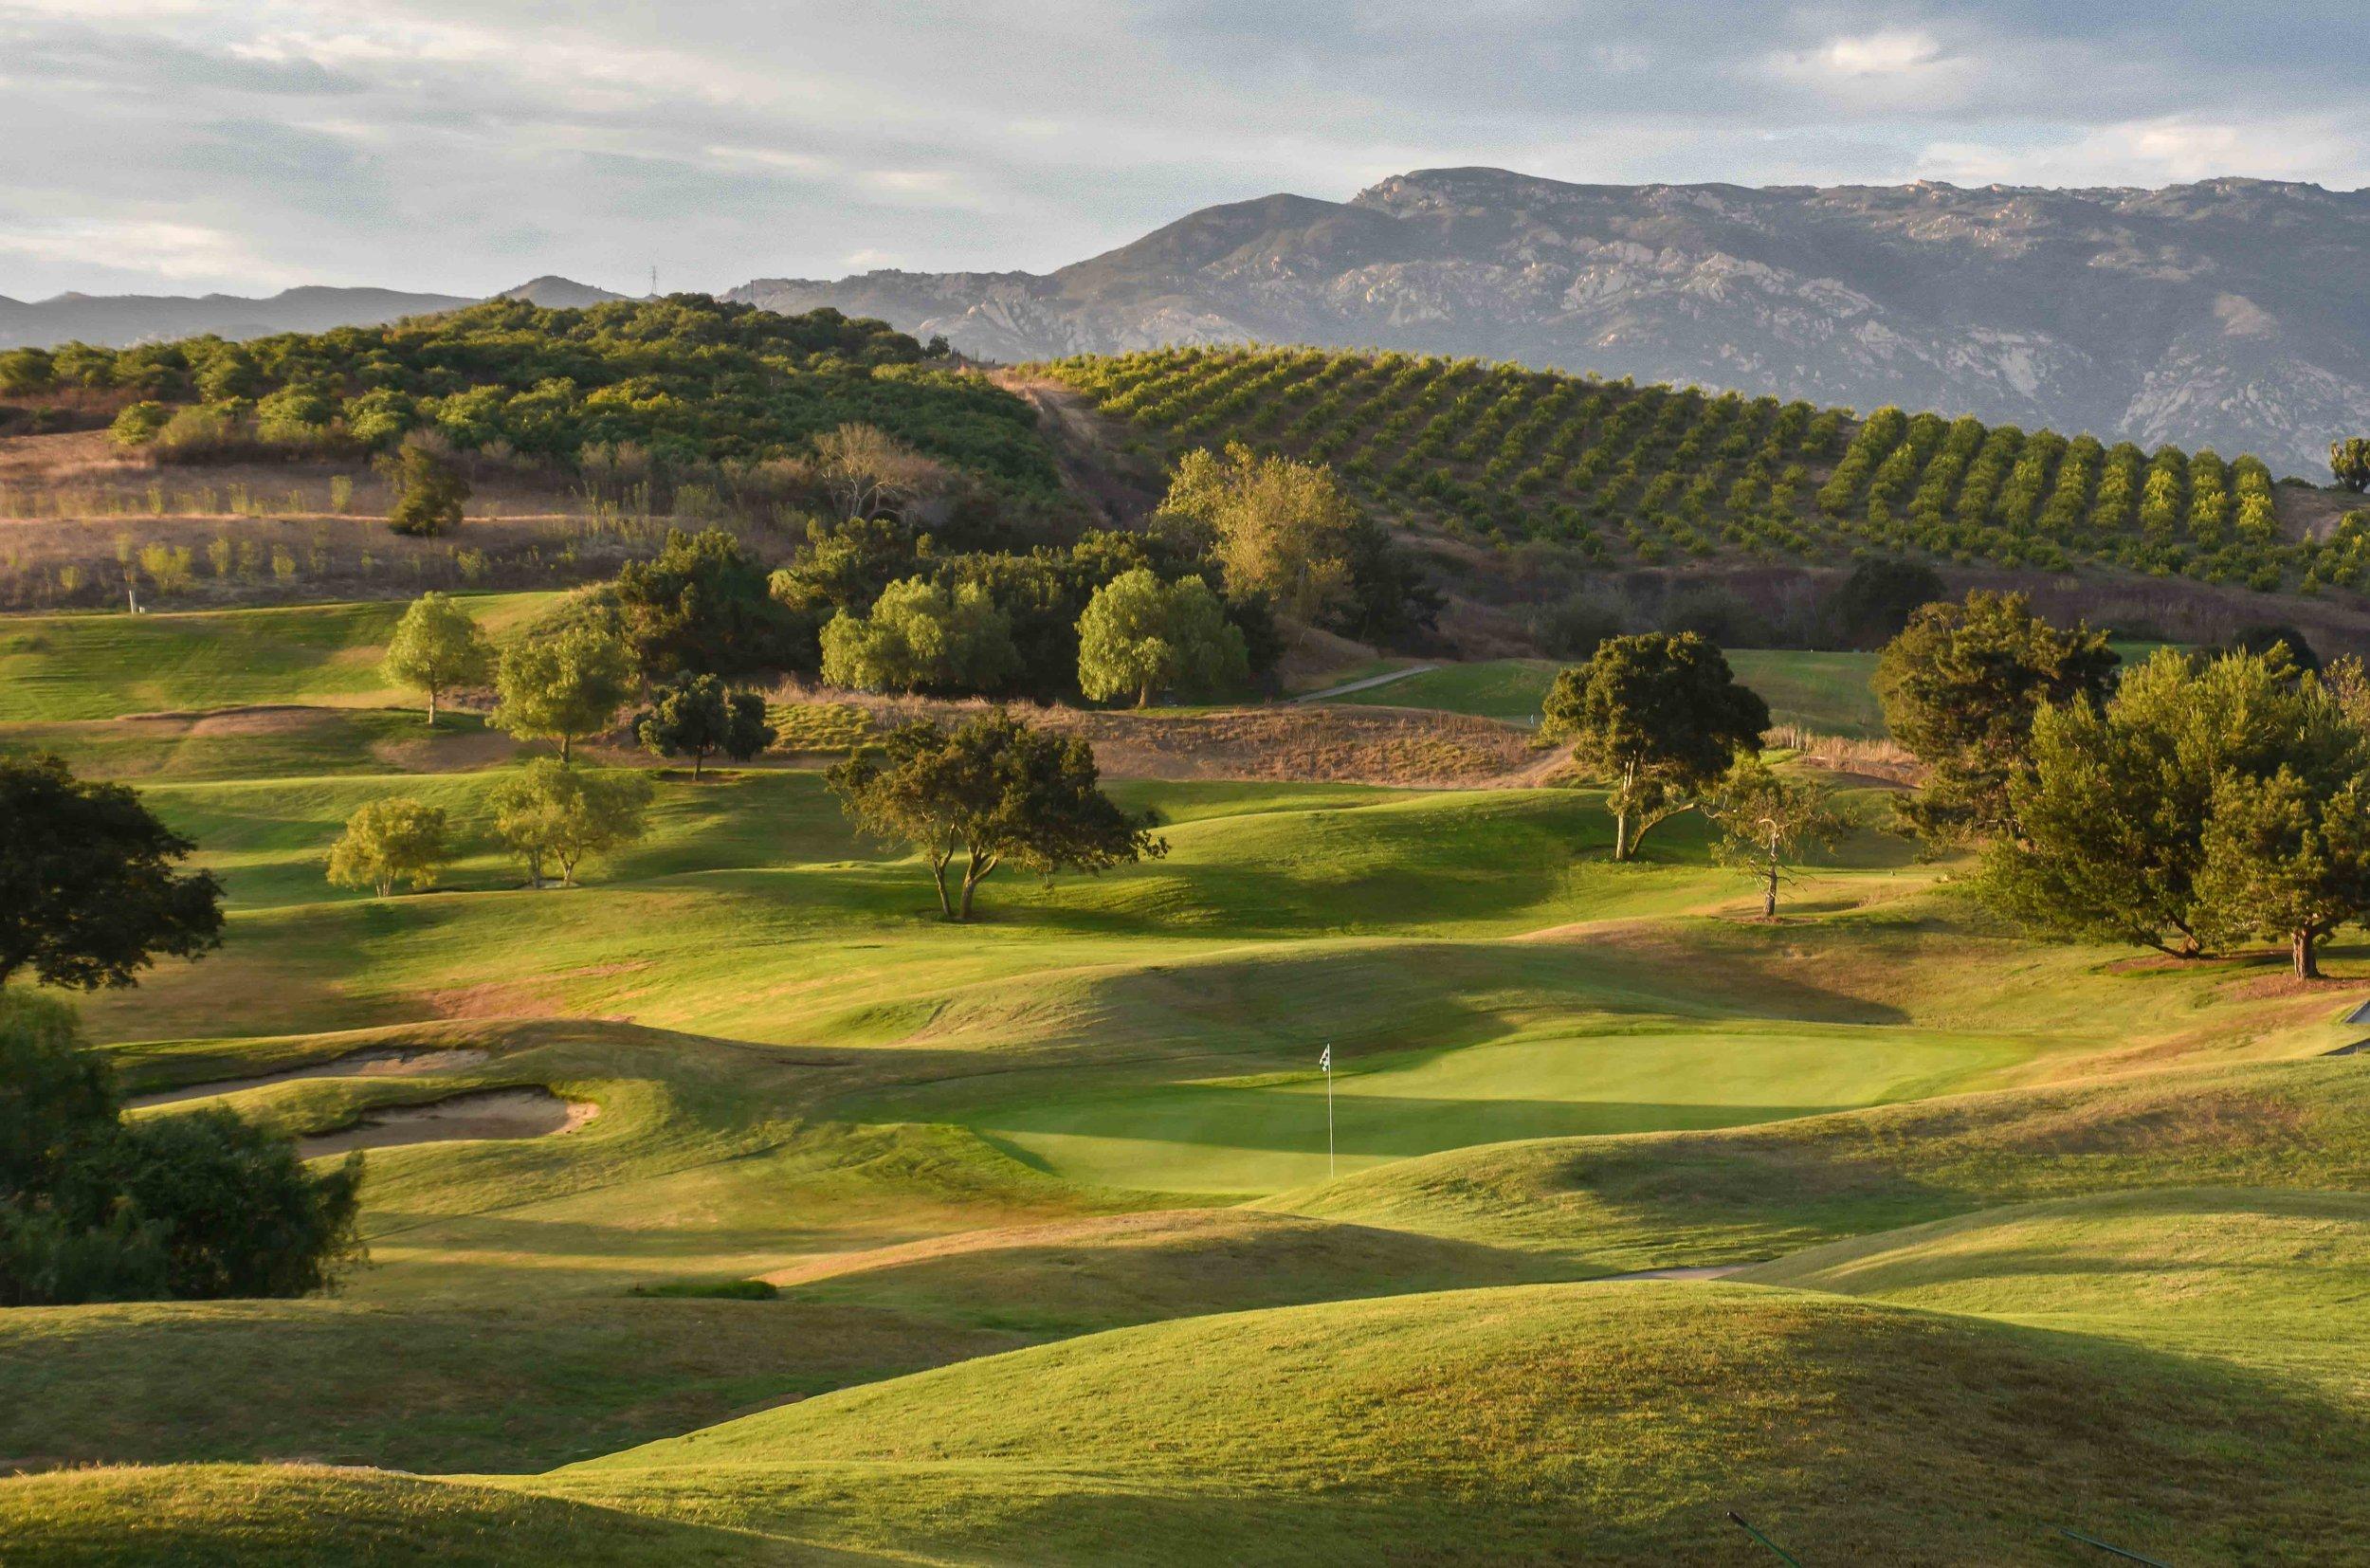 The sun sets on an excellent Goleta weekend over  Glen Annie Golf Club